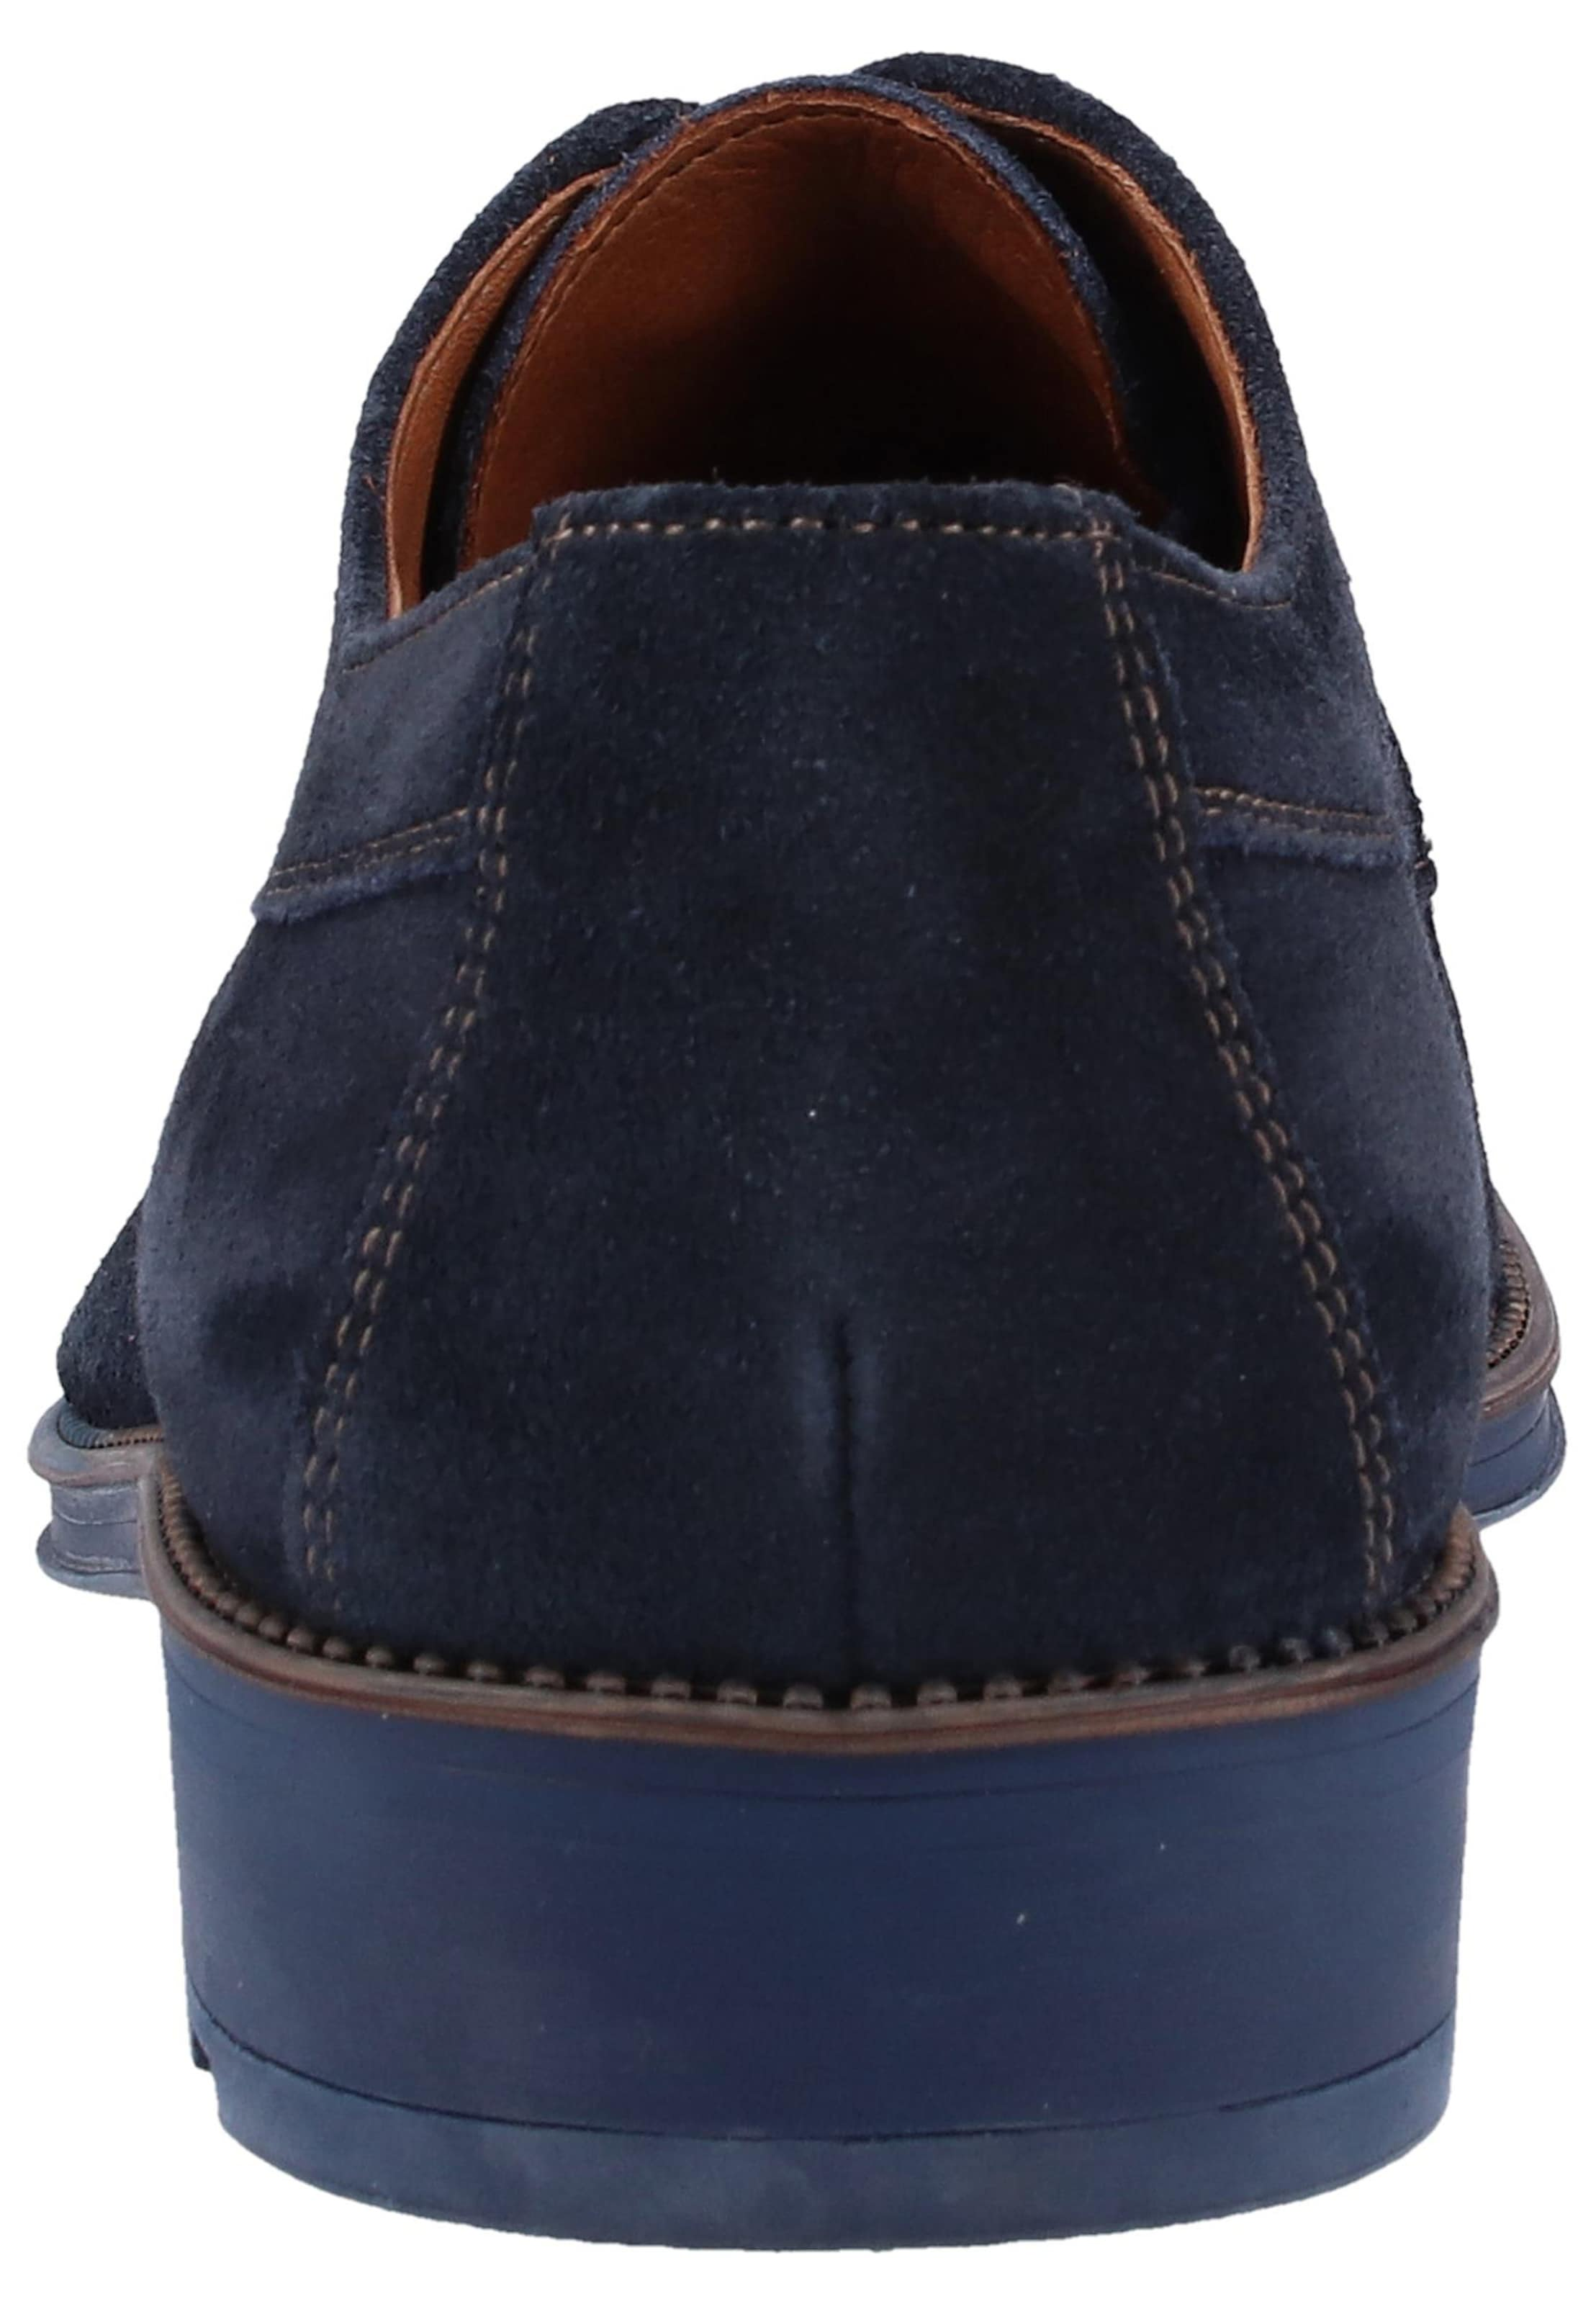 Chaussure Lloyd Lacets En À Bleu mNnwO80vPy